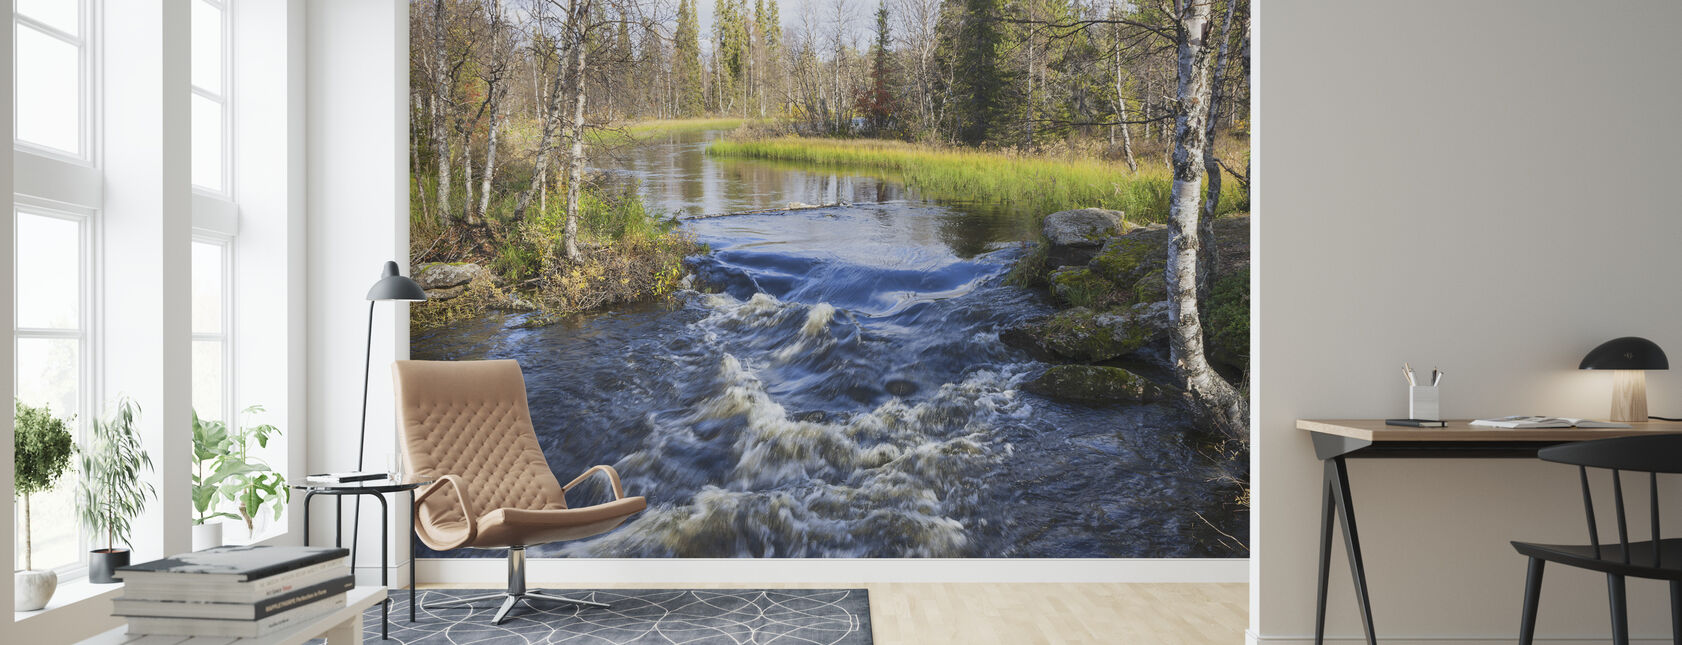 Lapland River - Wallpaper - Living Room